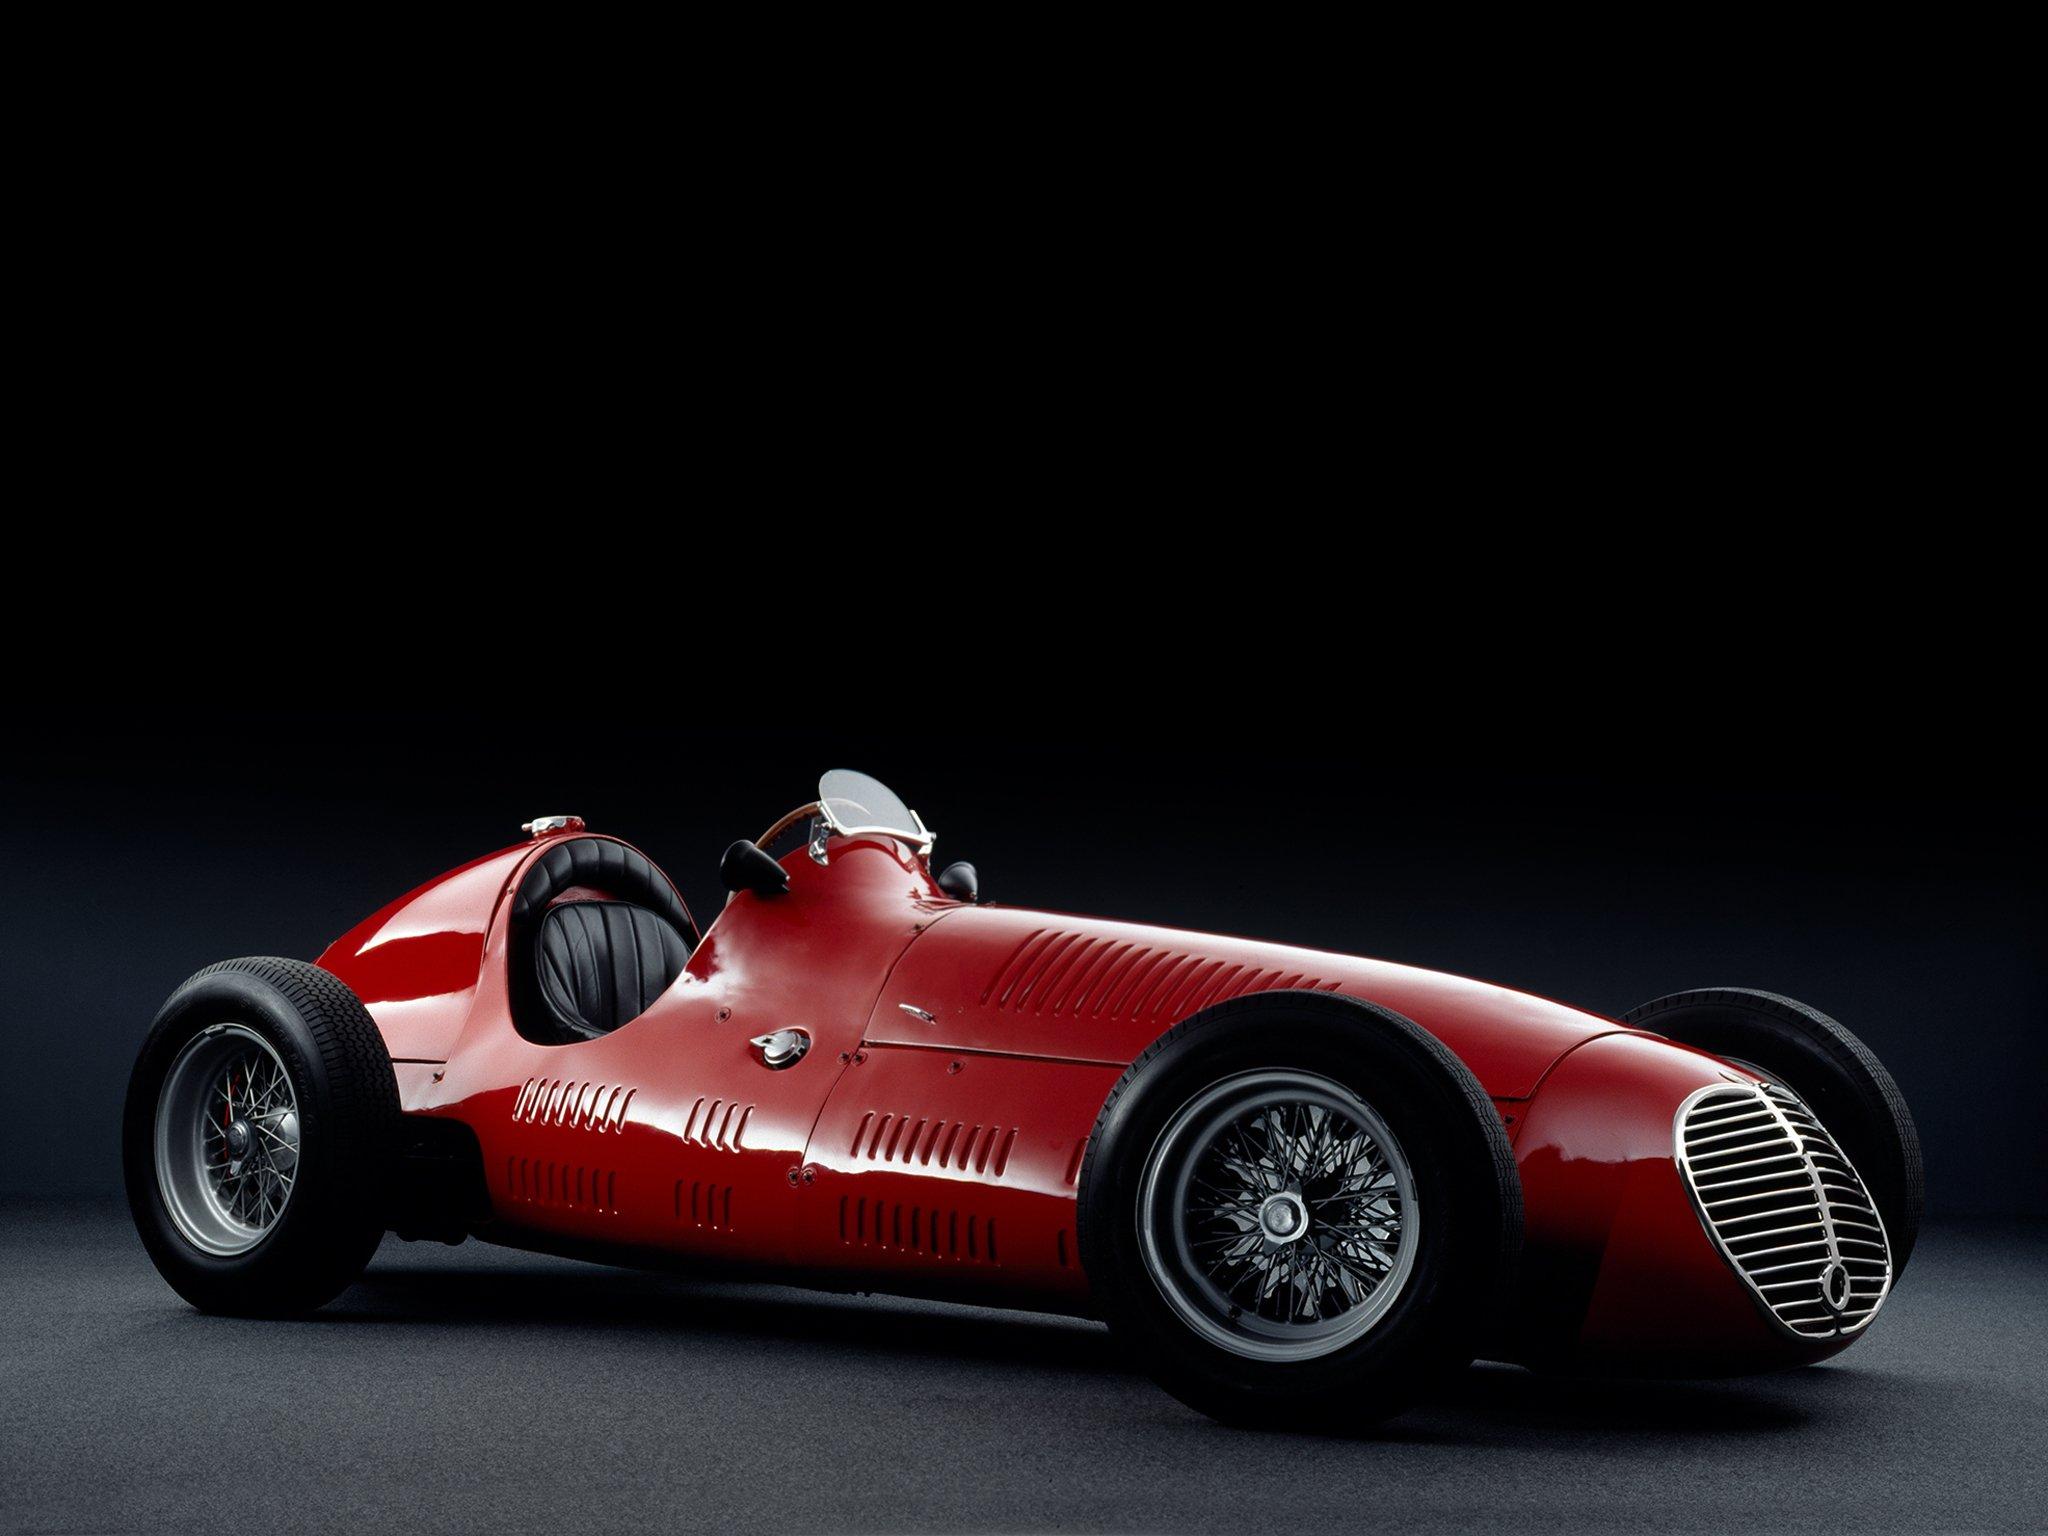 S Maserati Indy Car